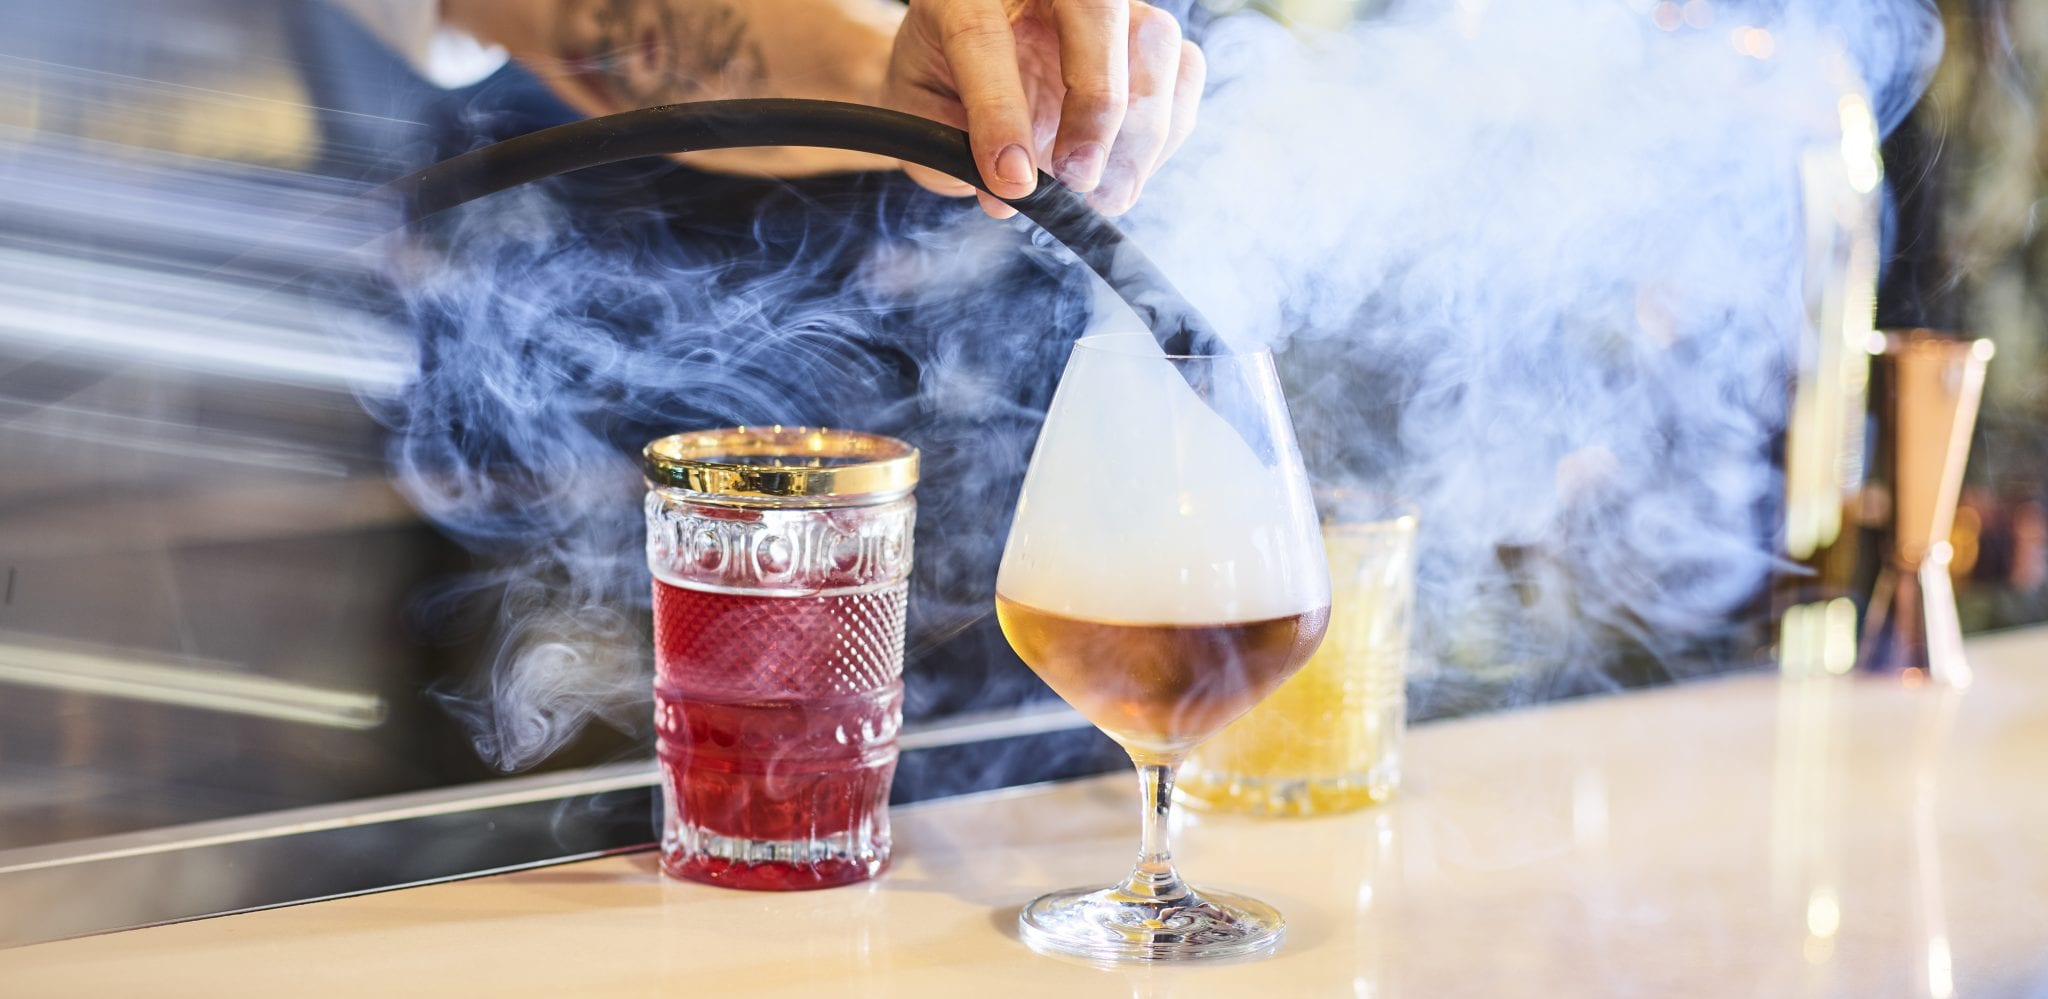 DIFC signature cocktail